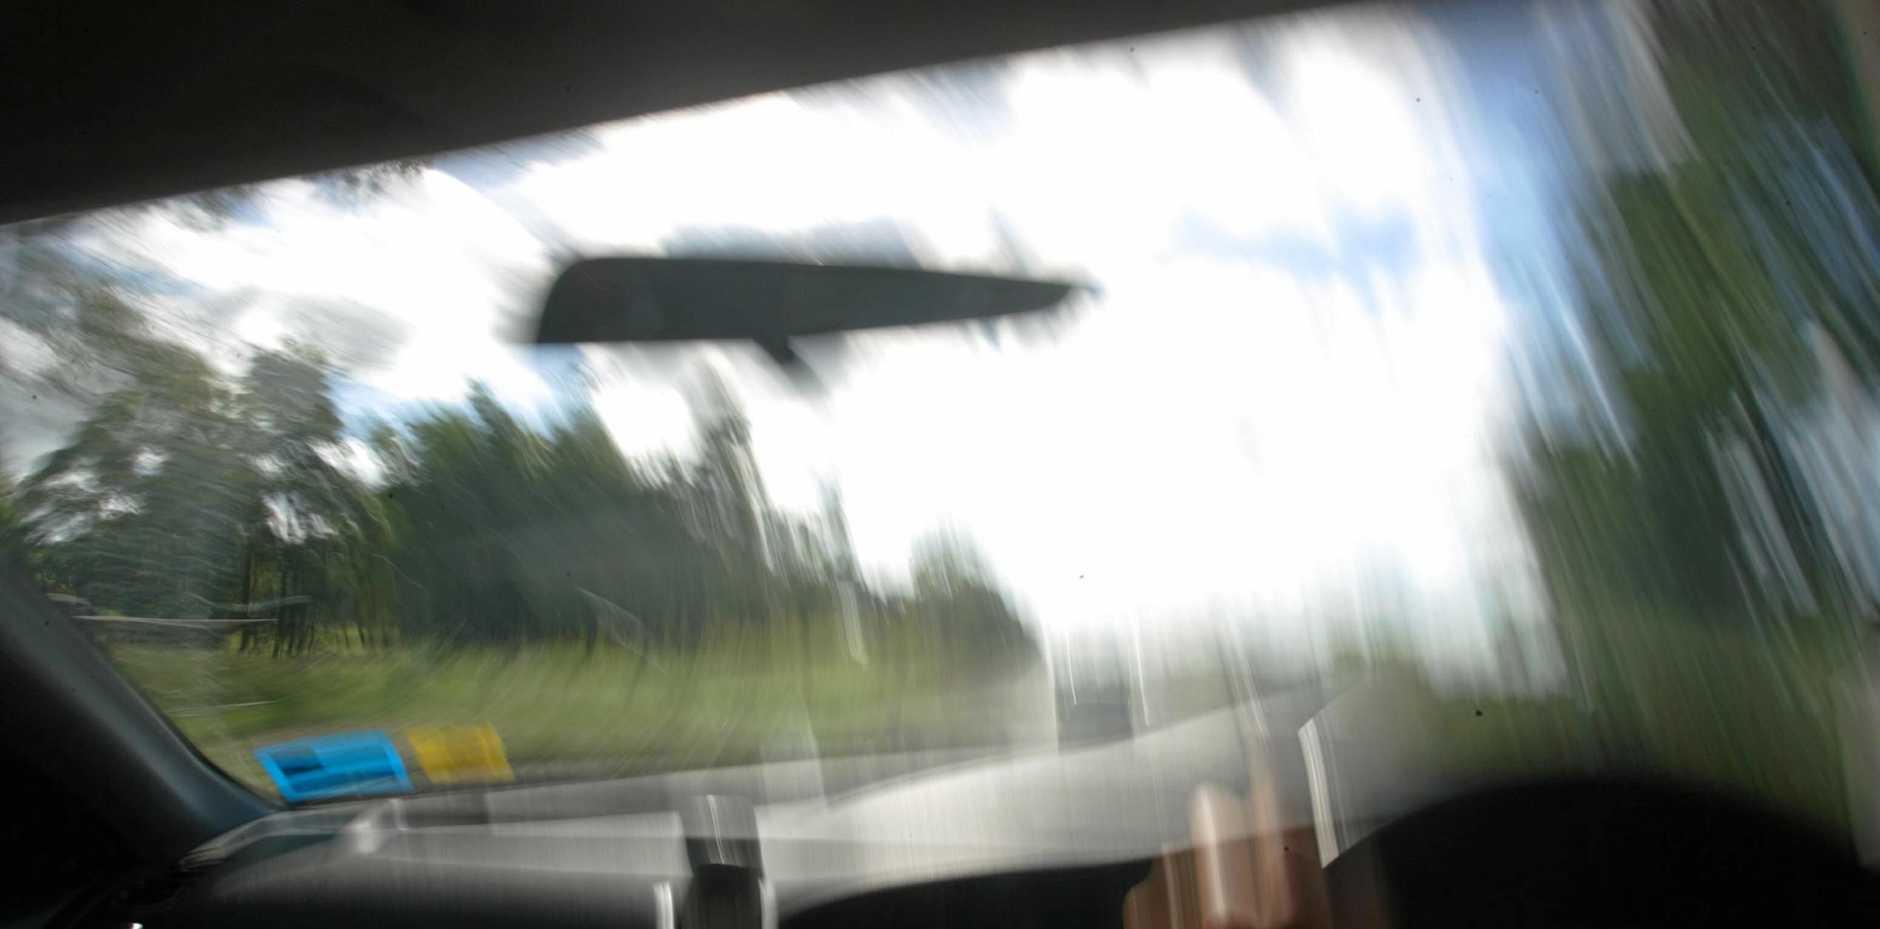 Drink driving. Road Rage. Dangerous drivingPhoto: Brett Wortman / Sunshine Coast Daily